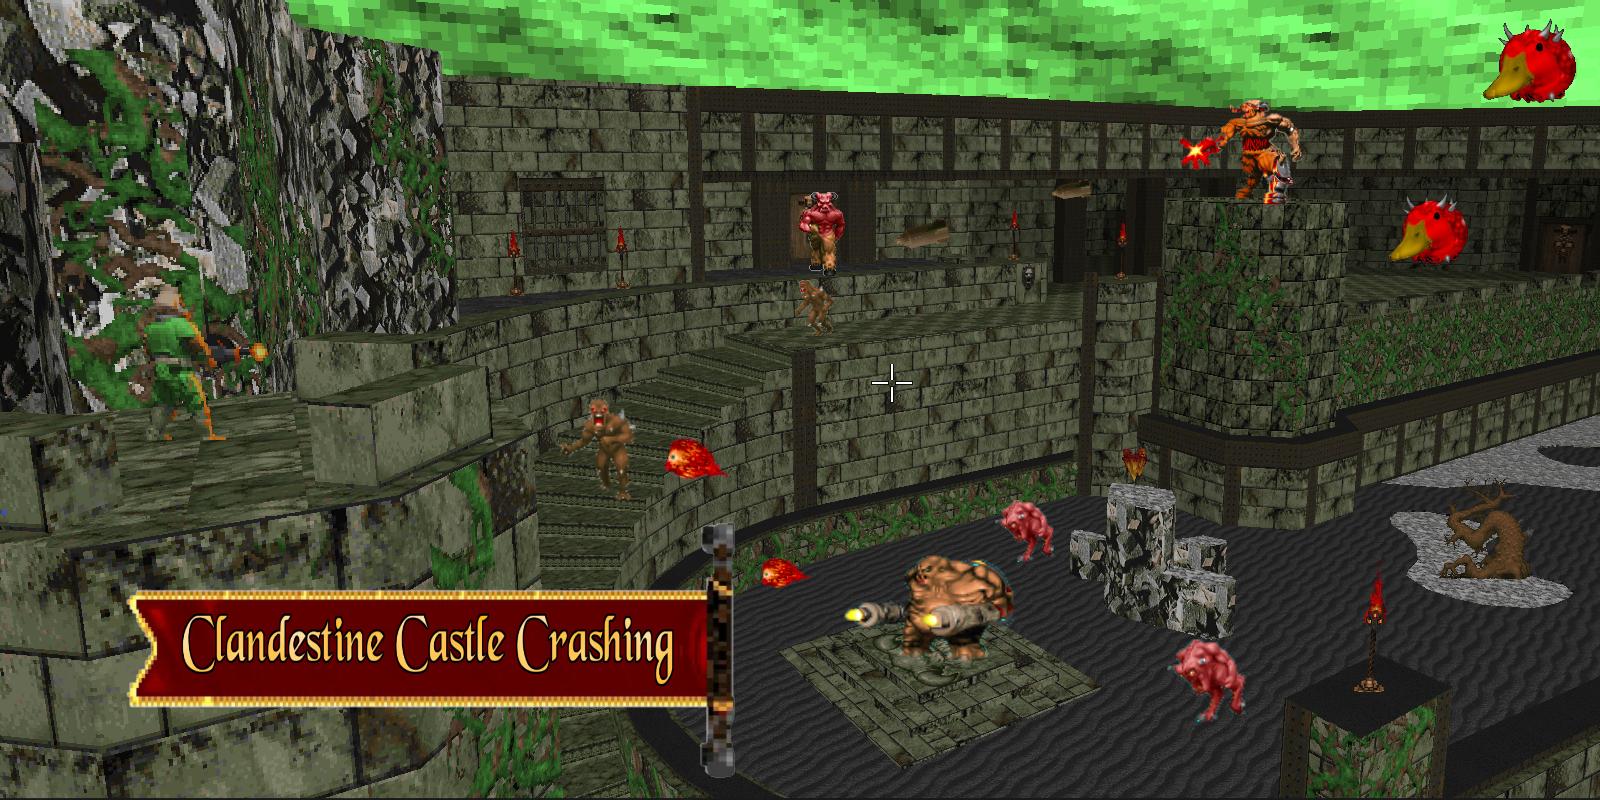 Castle_Crashers_Promo.png